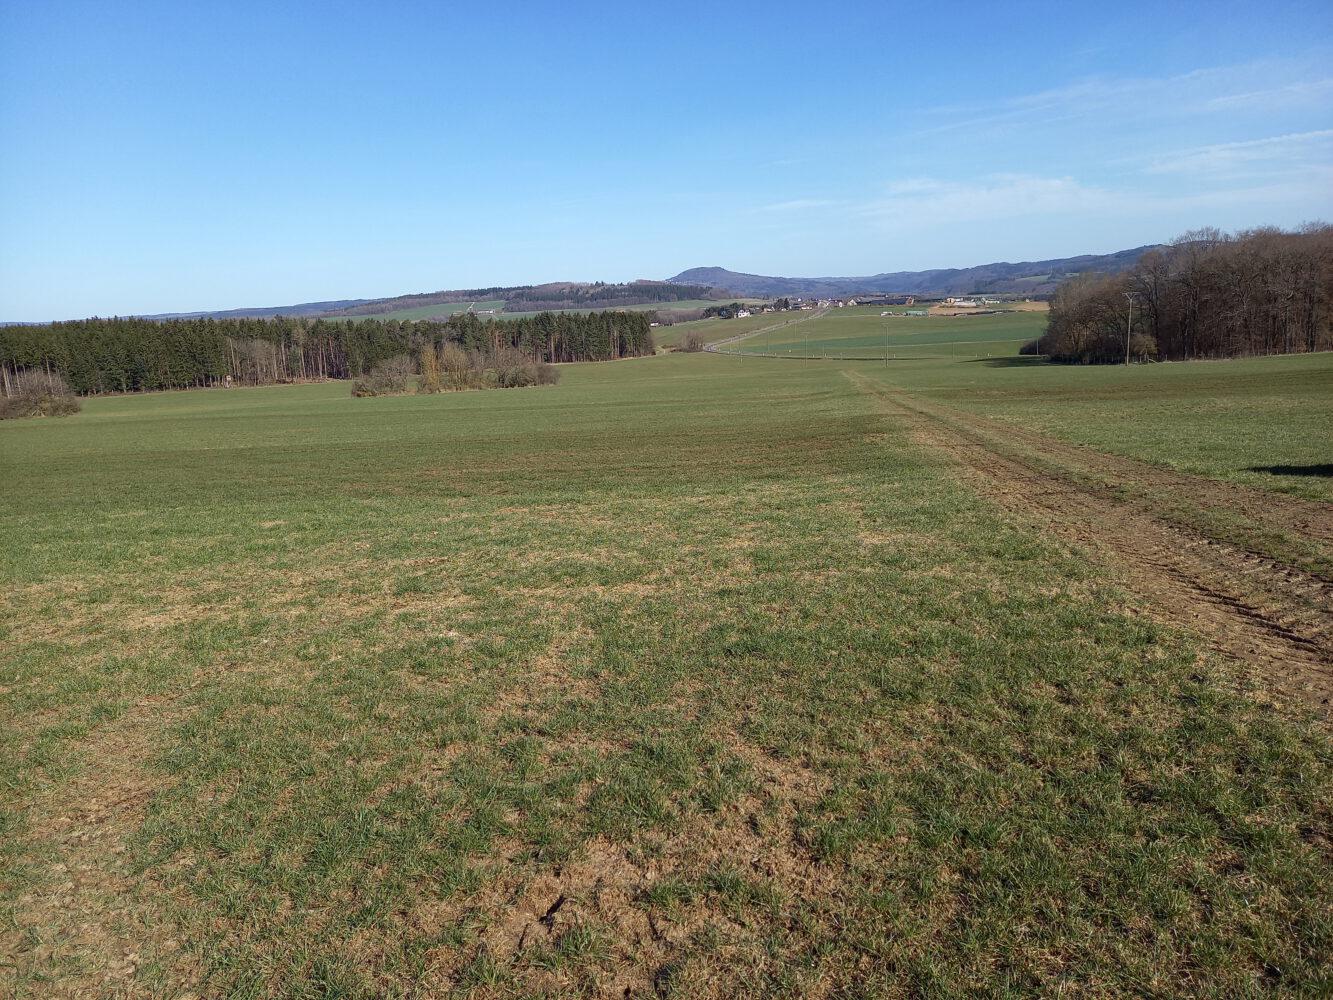 Vollzug des Grundstückverkehrsgesetzes